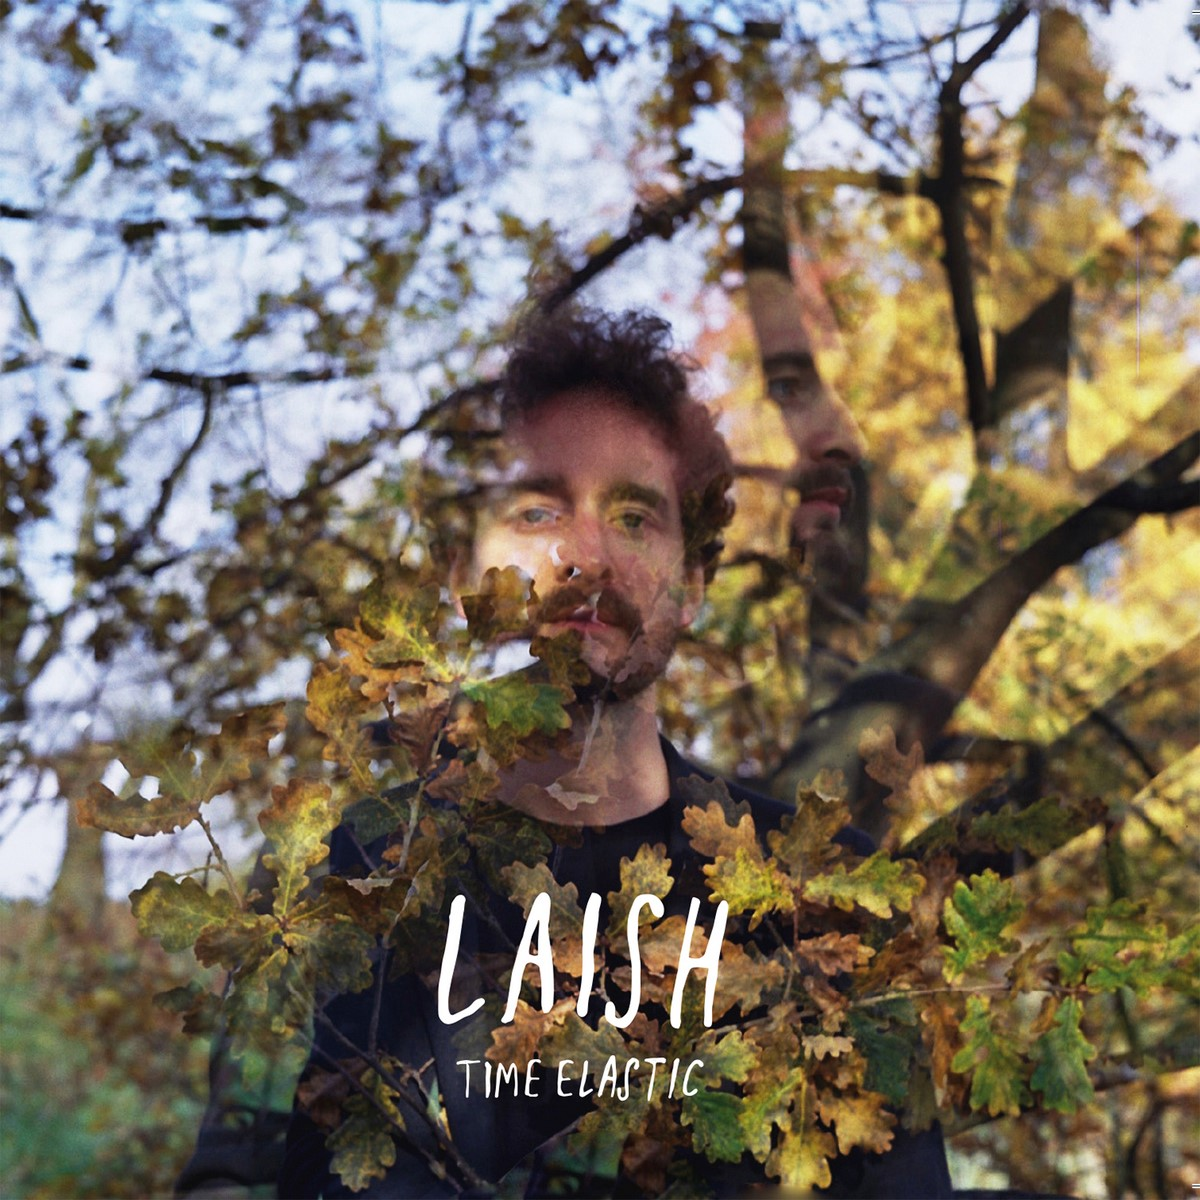 Laish - Time Elastic